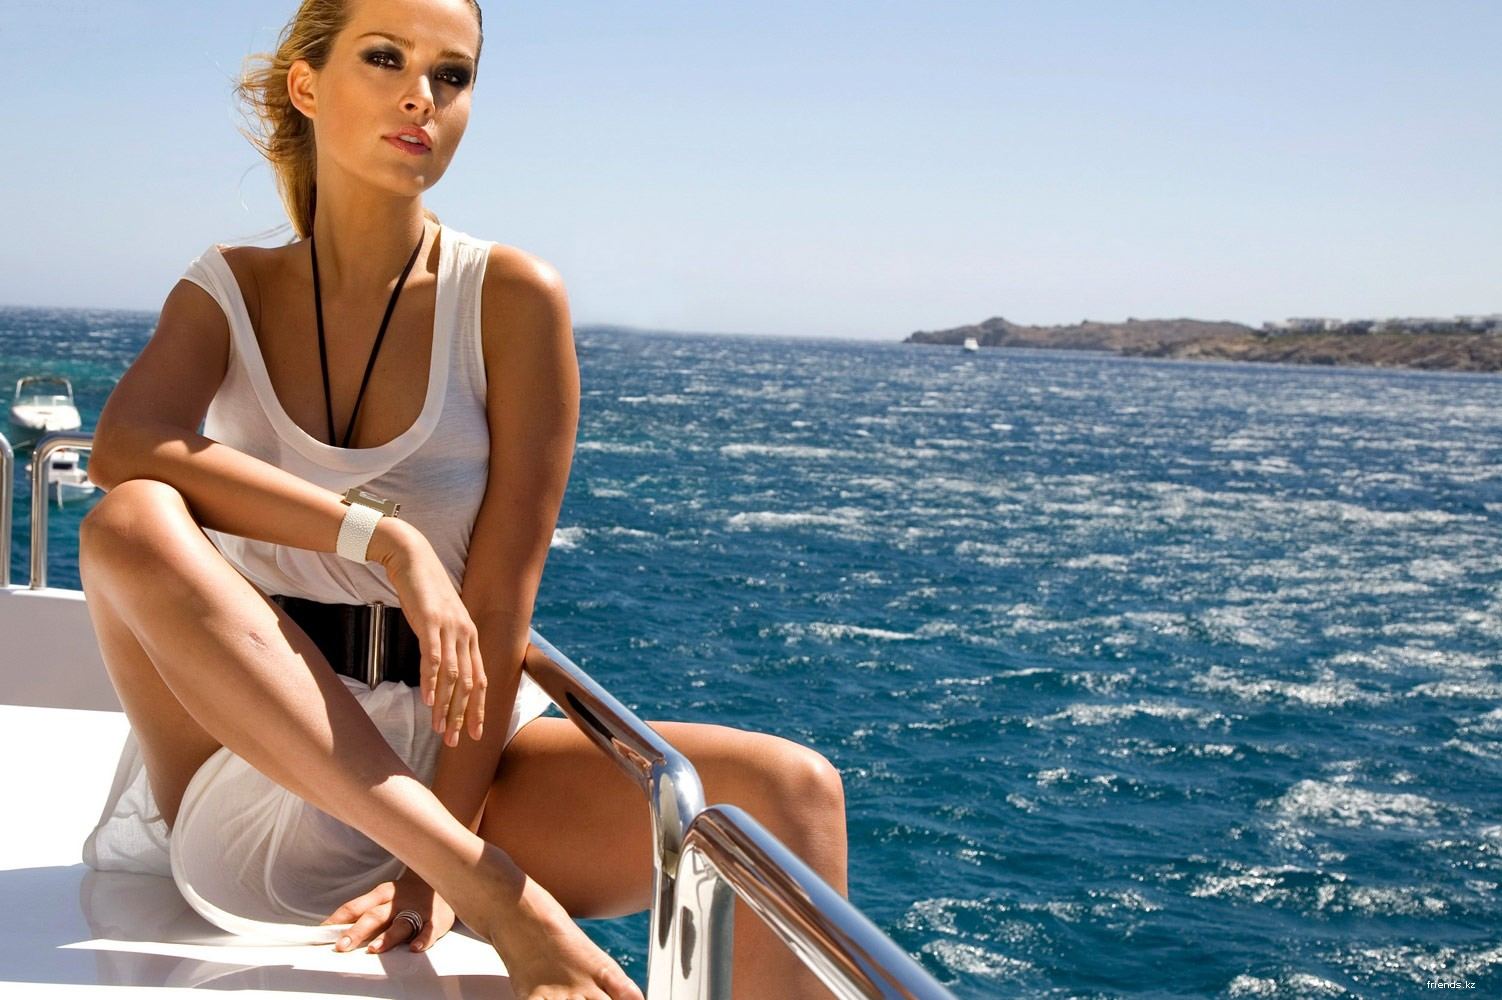 Фото девушек с яхтами